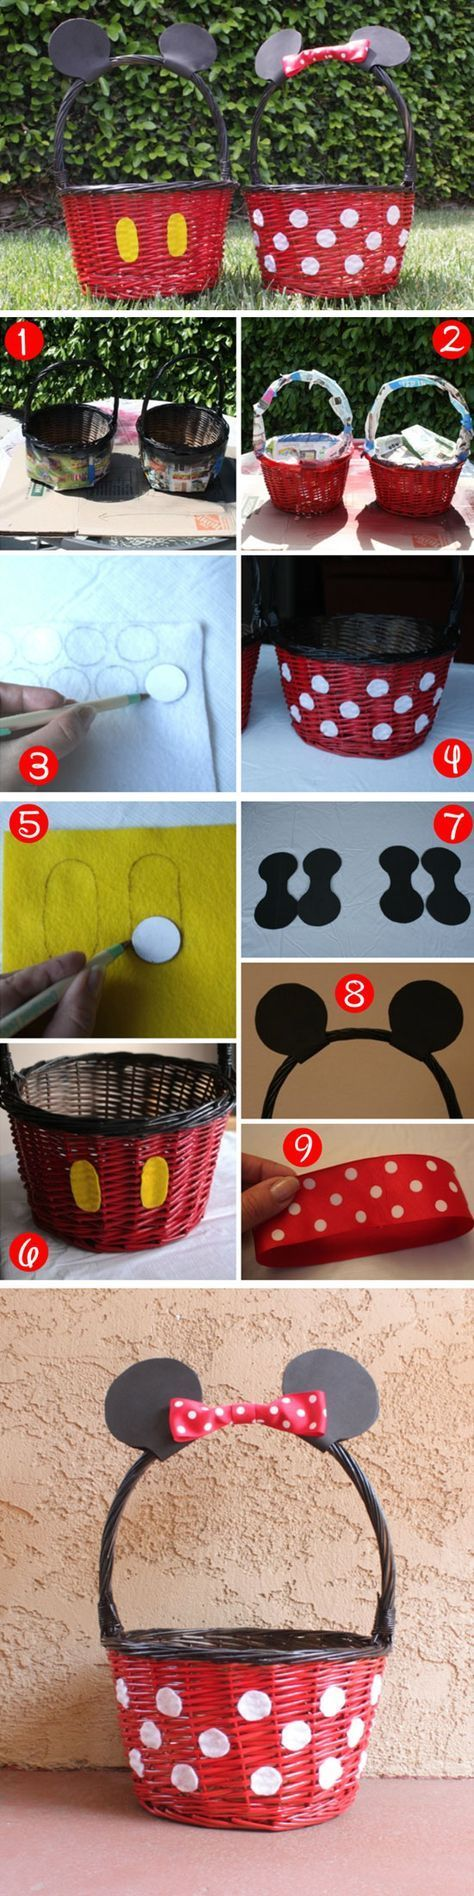 Mickey & Minnie Baskets | Easy DIY Easter Basket Ideas for Kids | Homemade Easter Baskets for Kids to Make